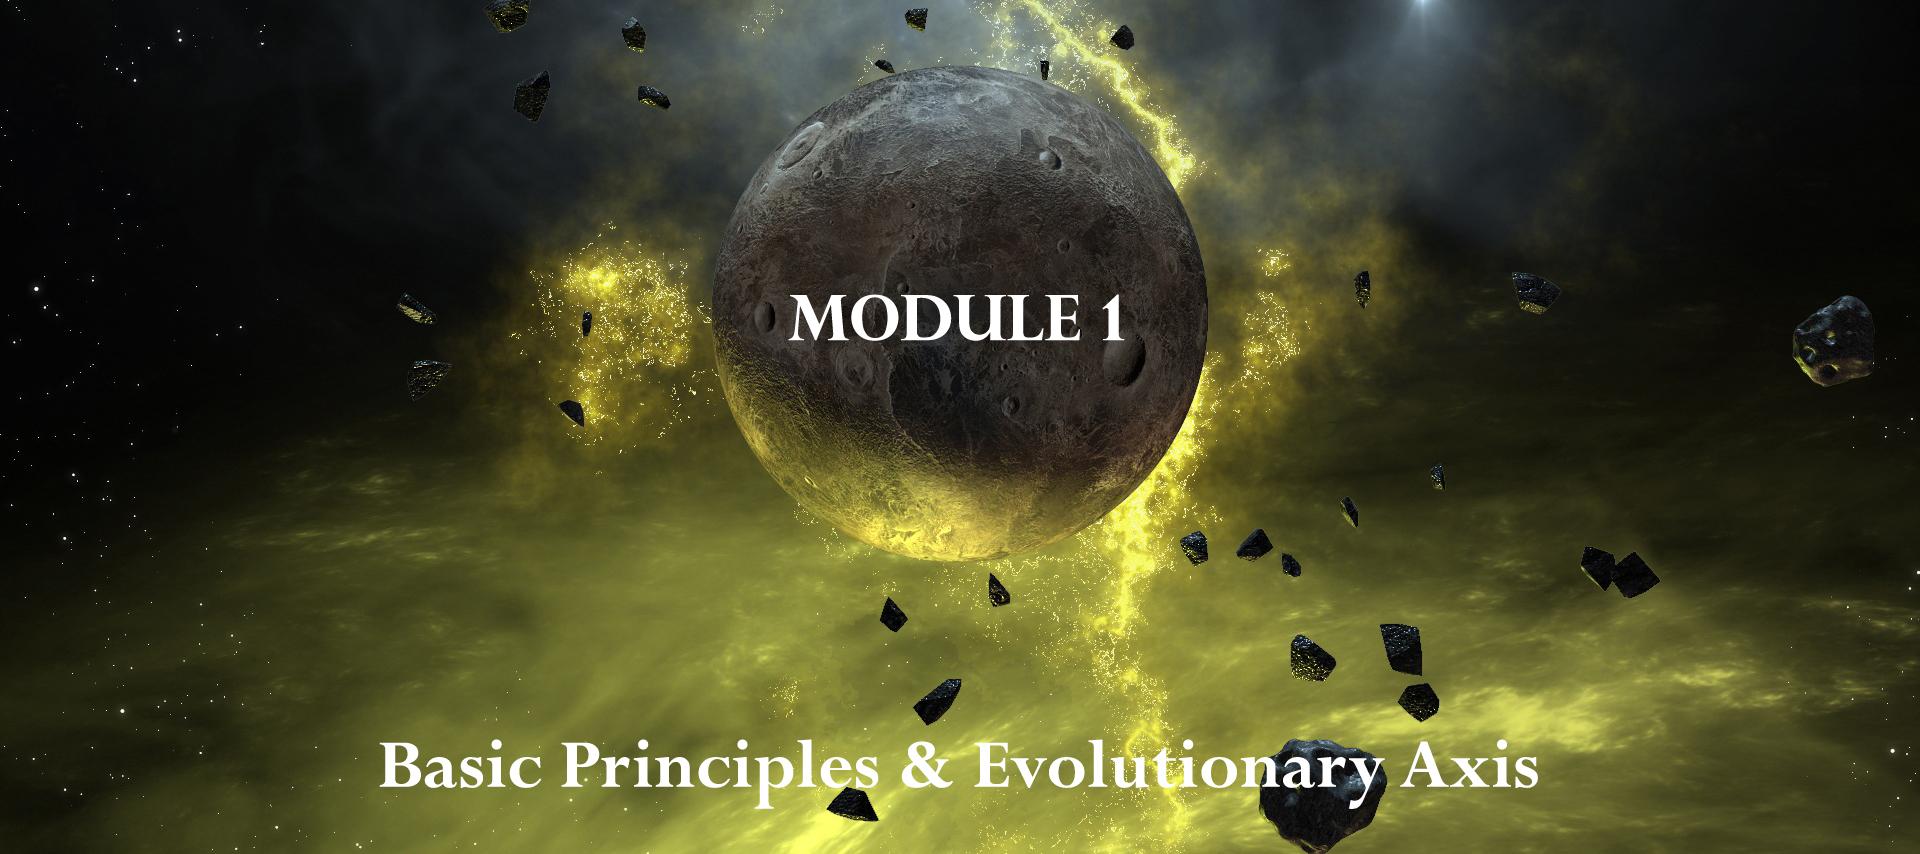 Module 1: Basic Principles & Evolutionary Axis